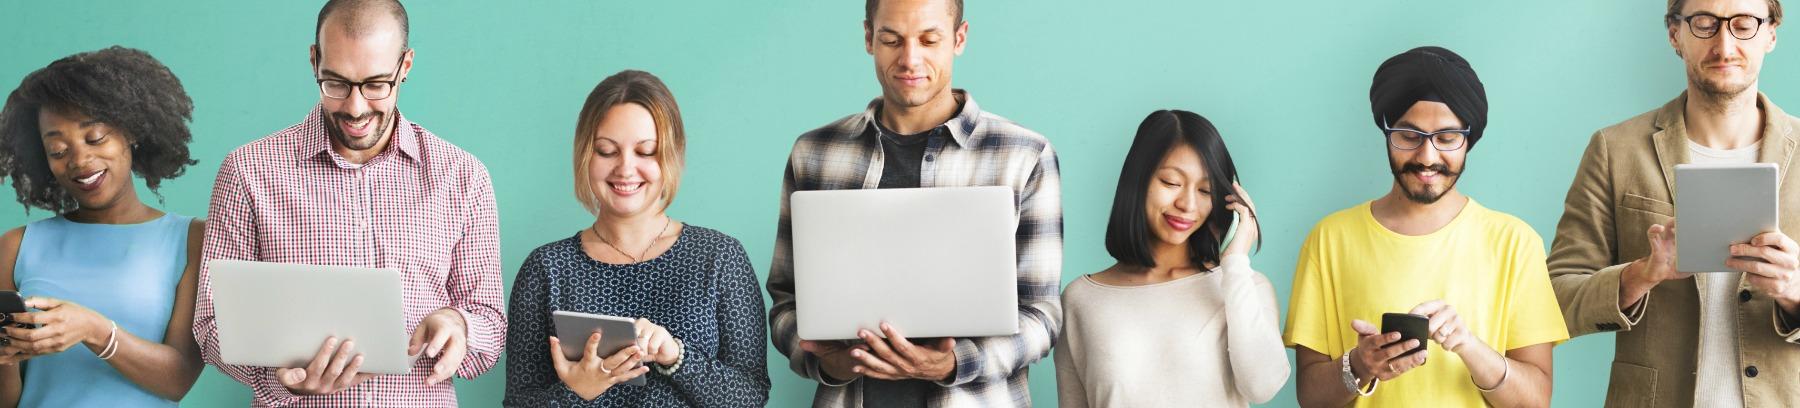 Digital Markeign Trend 2017 School Webinar